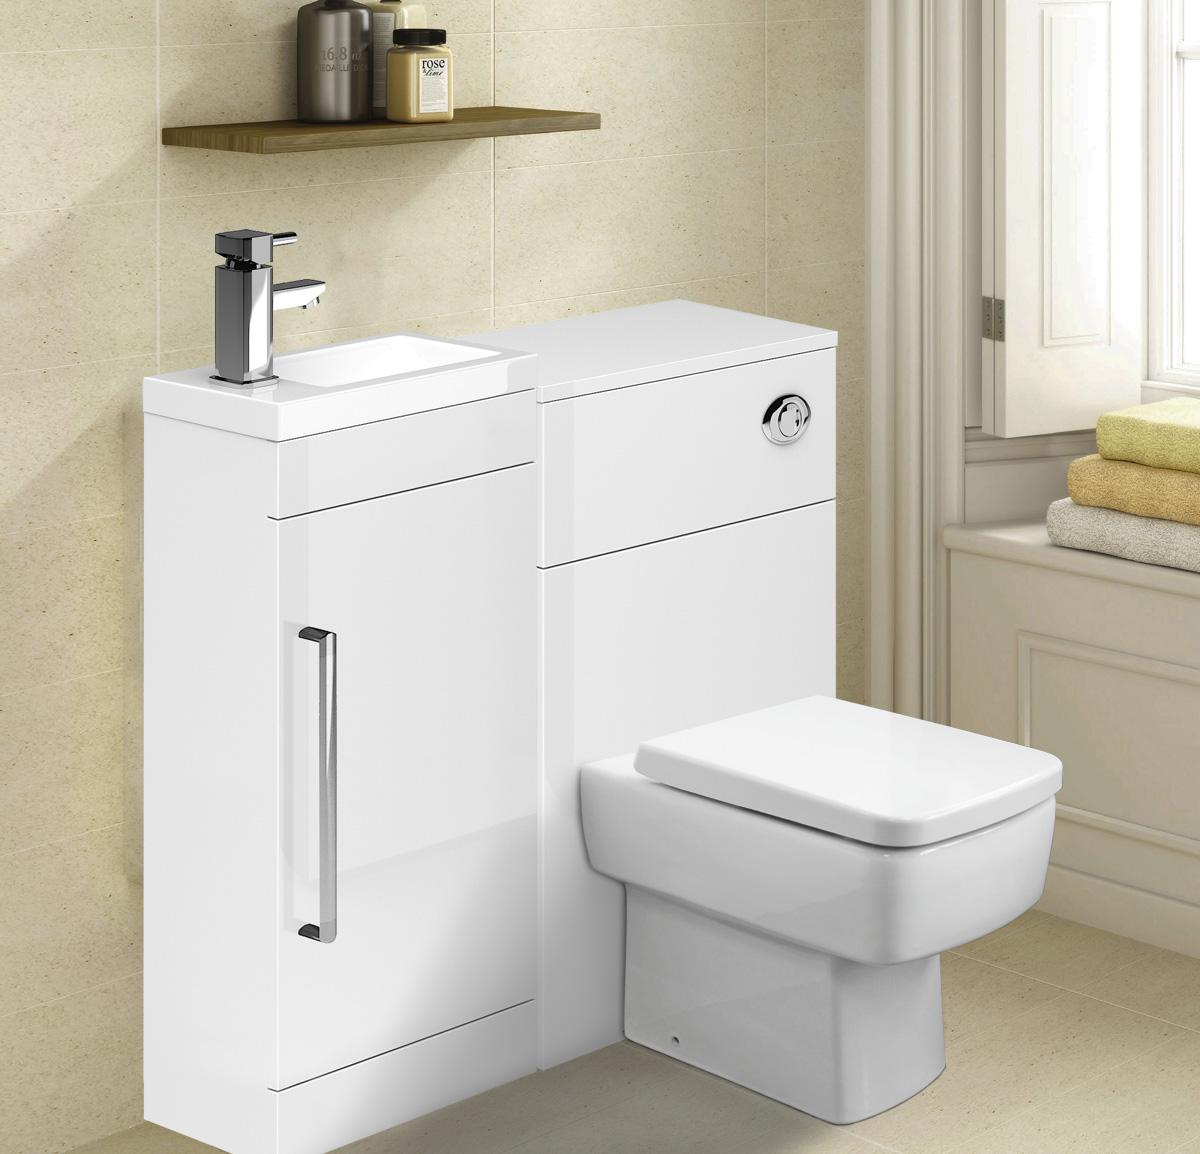 White british made bathroom furniture-Tilemaze